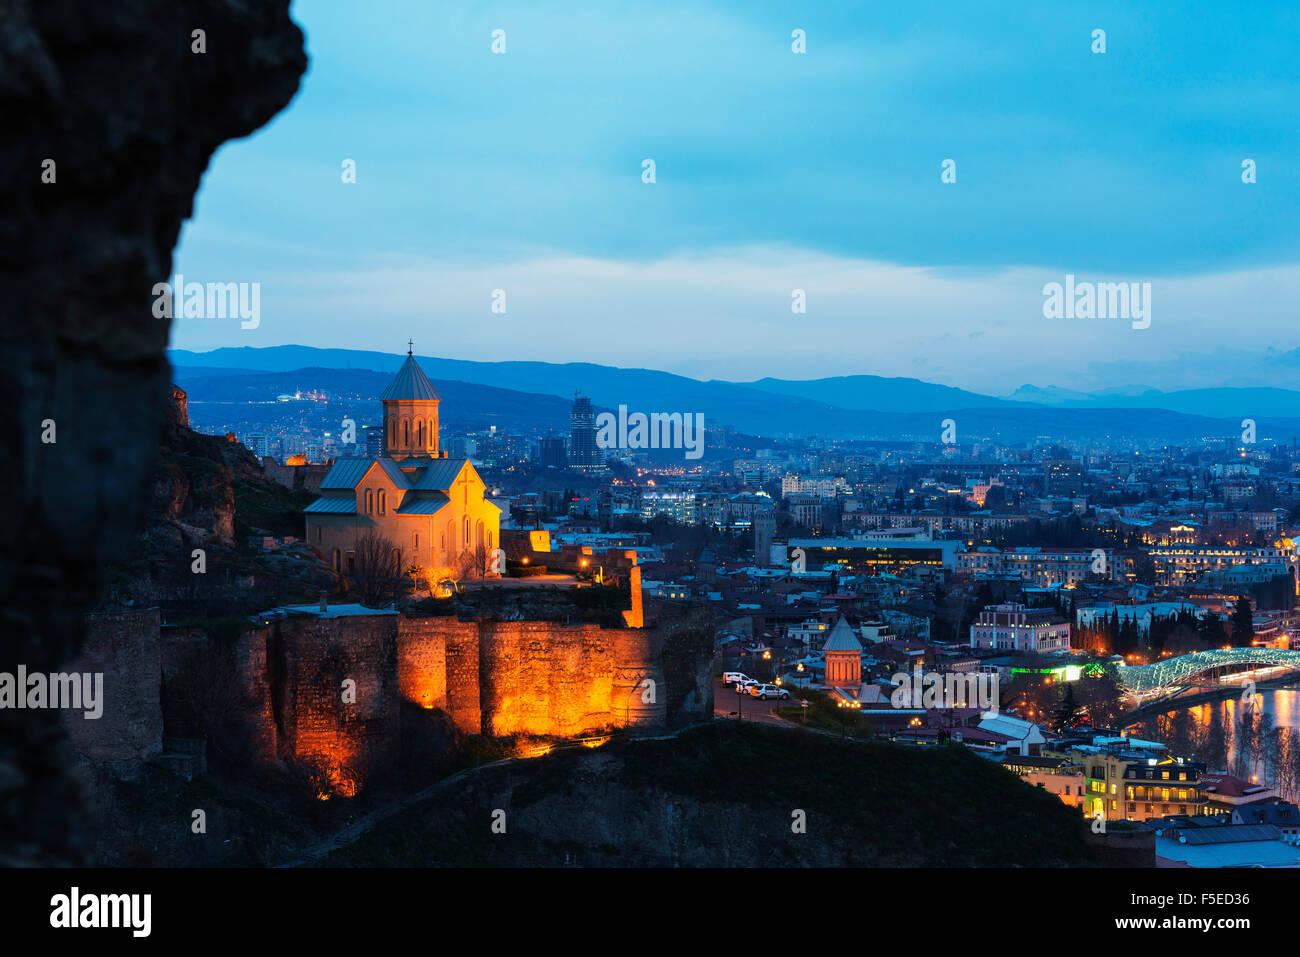 Iglesia de San Nicolás en la parte superior de la fortaleza Narikala, Tbilisi, Georgia, el Cáucaso, Asia Imagen De Stock